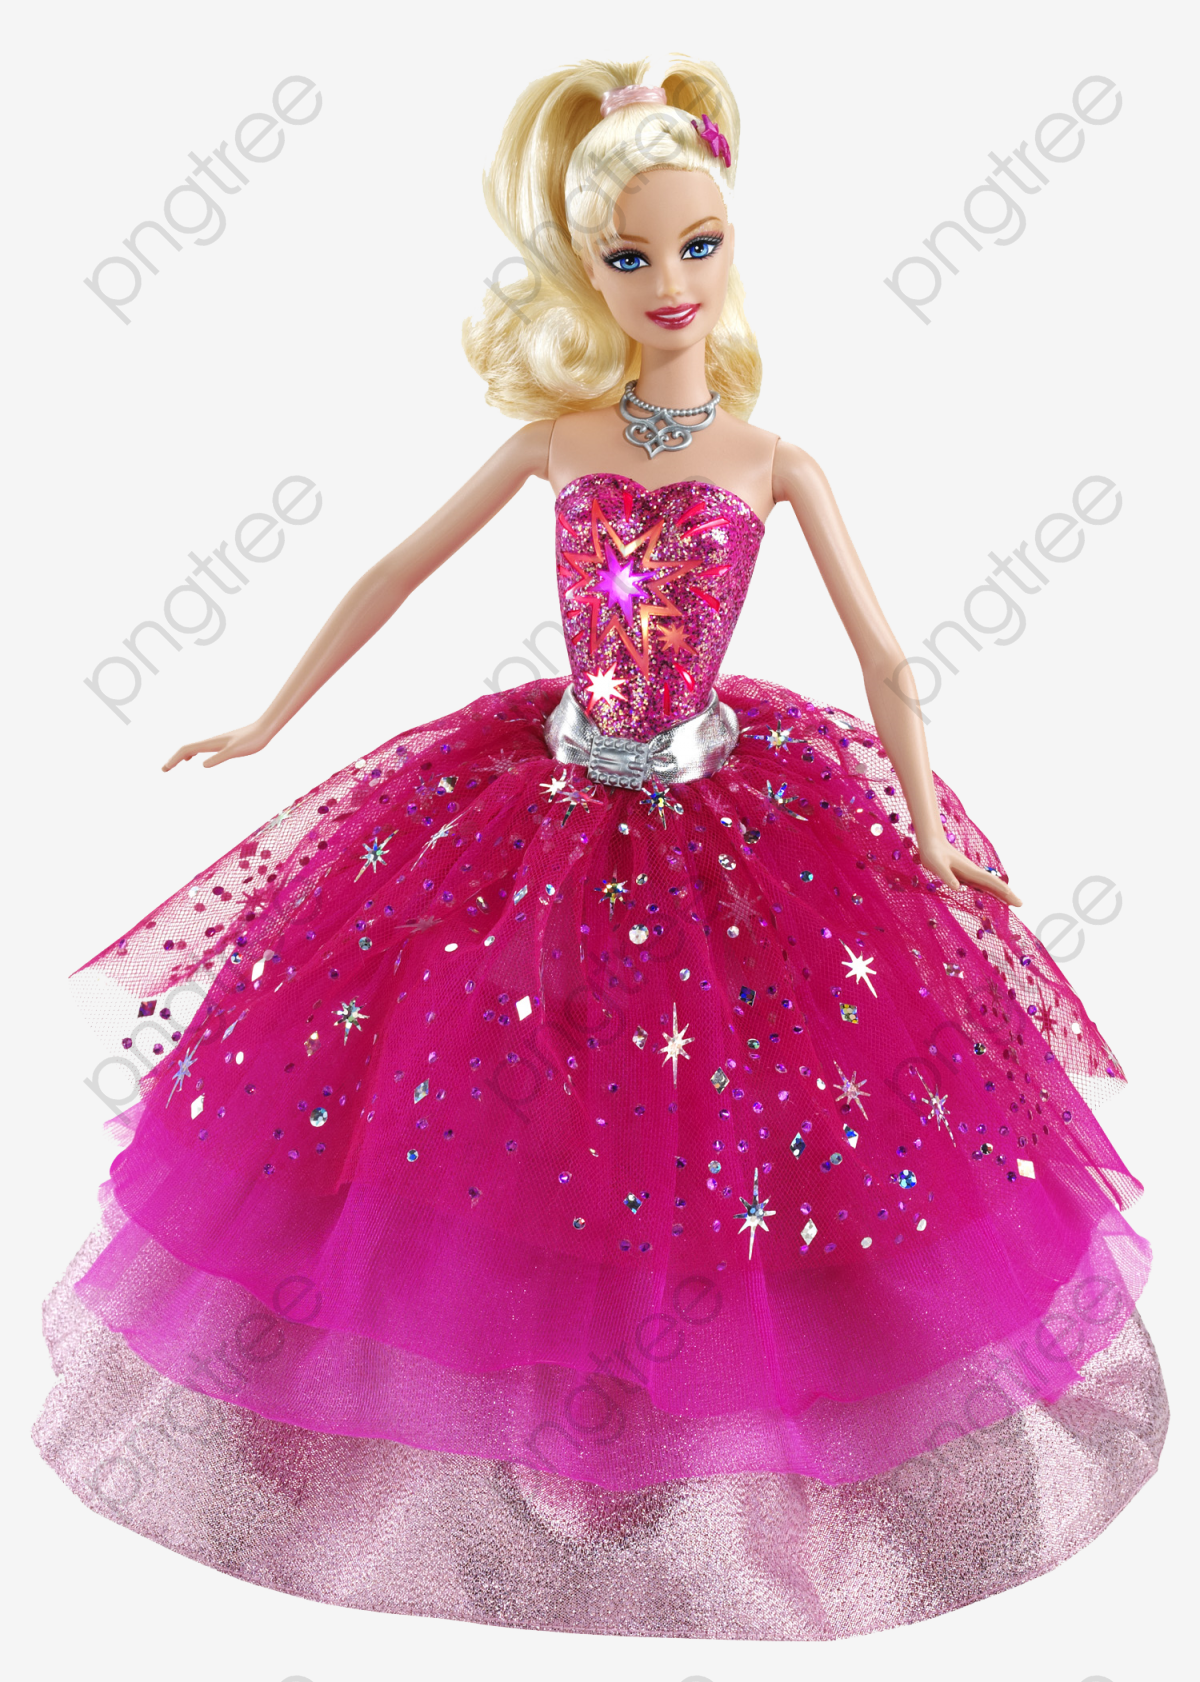 Pink Cute Barbie Dolls, Cute Clipart, Barbie Doll, Pink PNG.